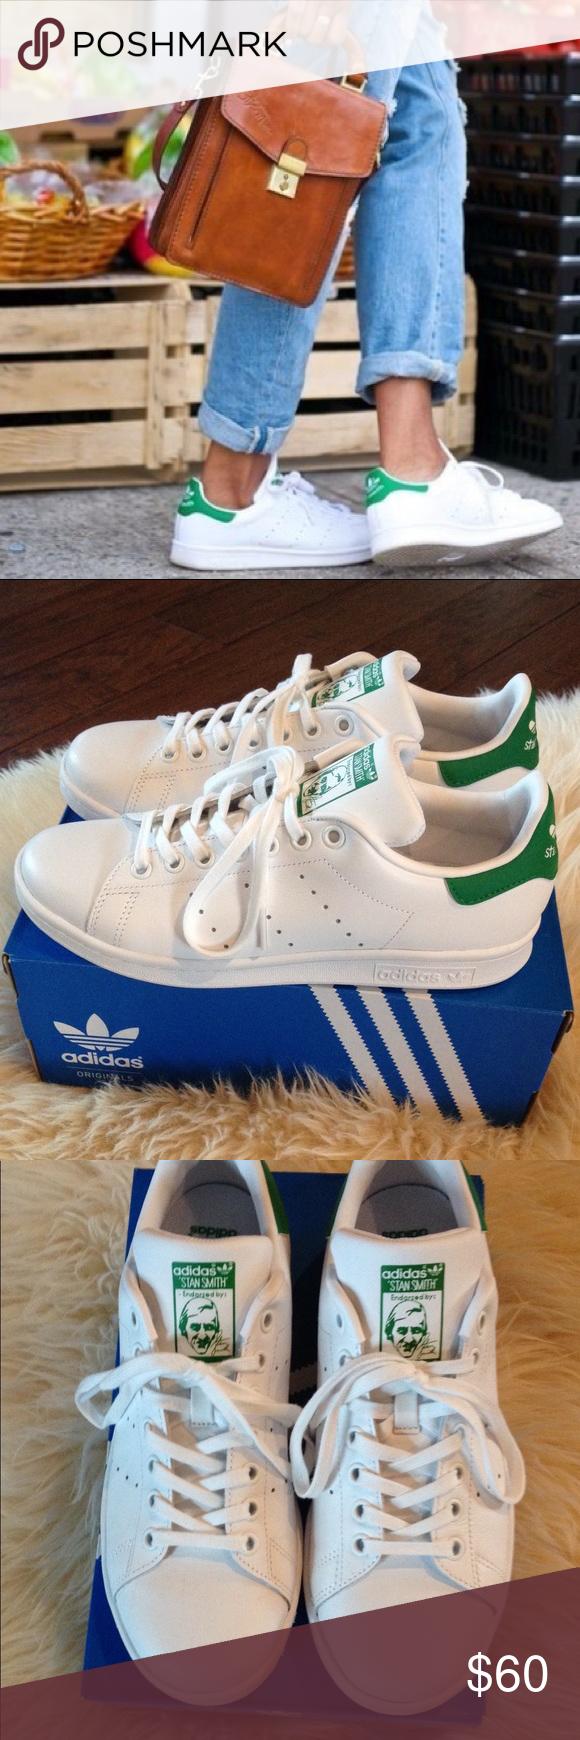 Adidas Originali Stan Smith J Originale Scarpe Da Tennis Nwt Originale J Stan Smith 645771